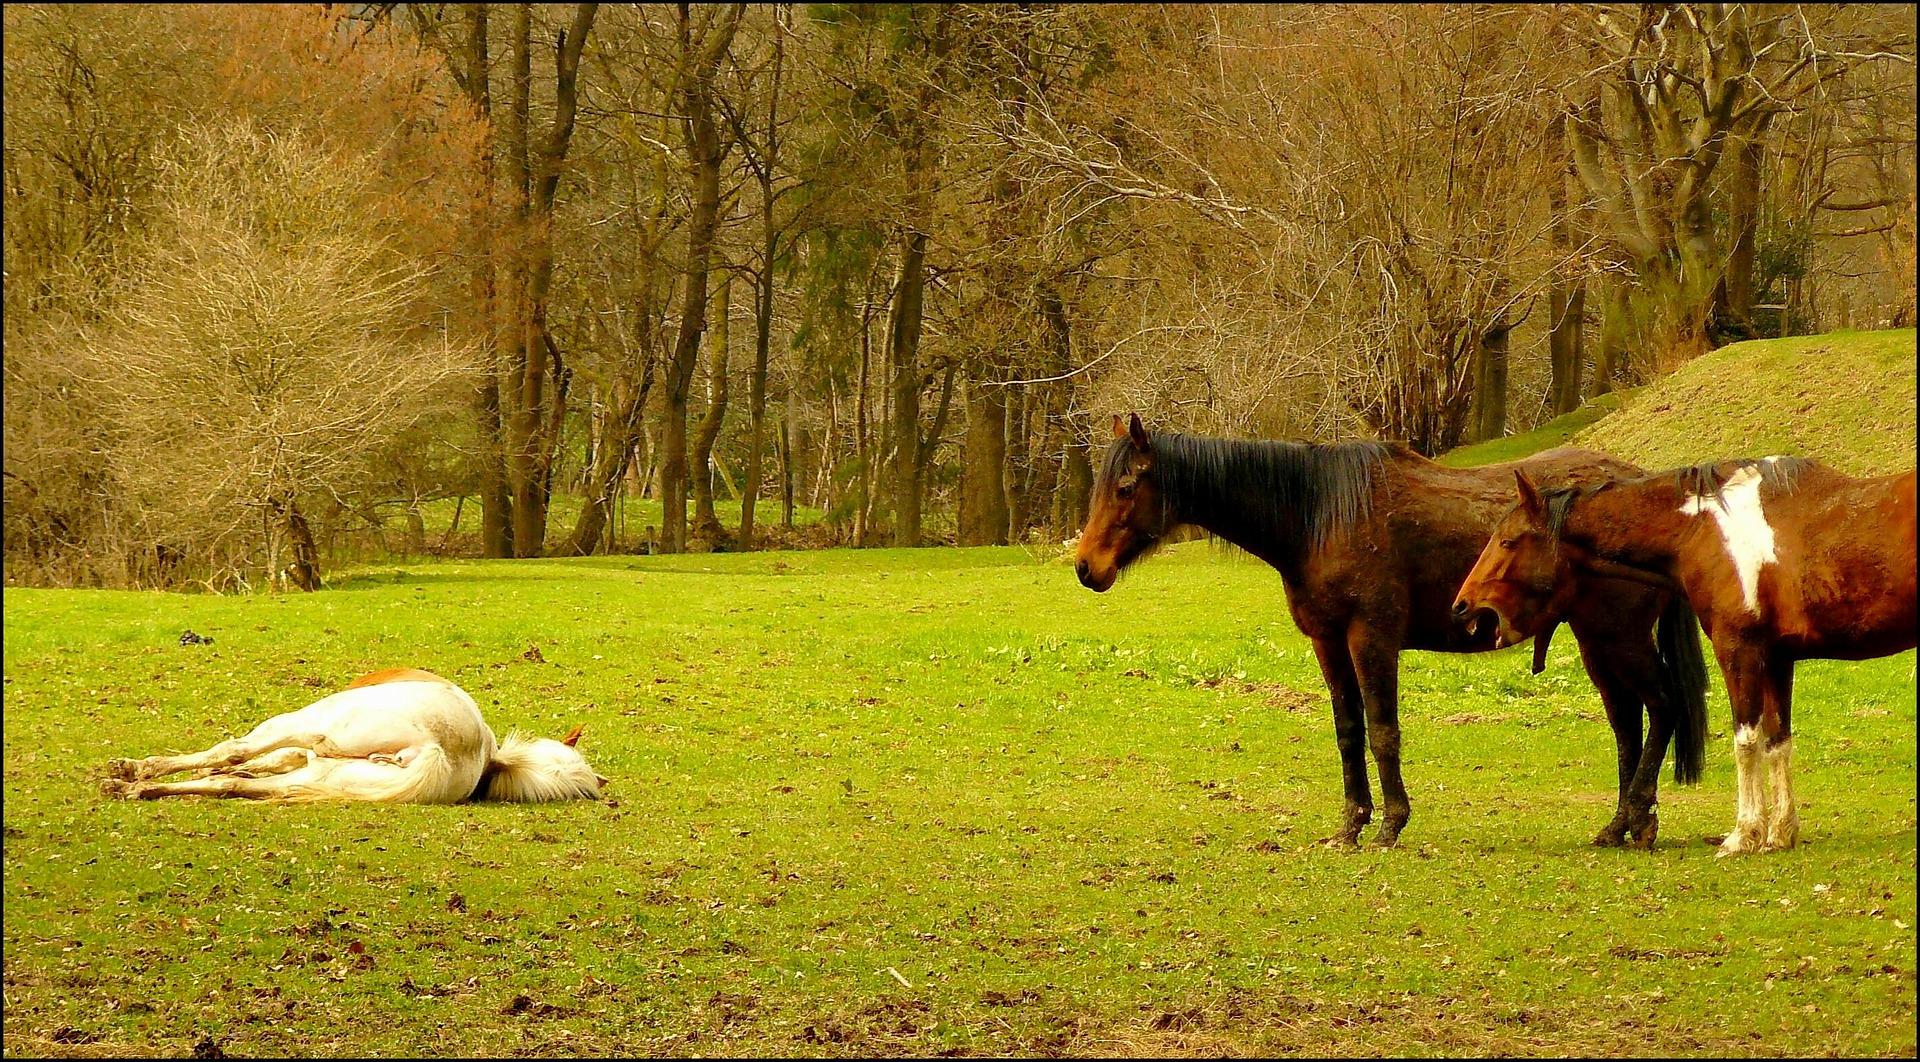 horse-271054_1920